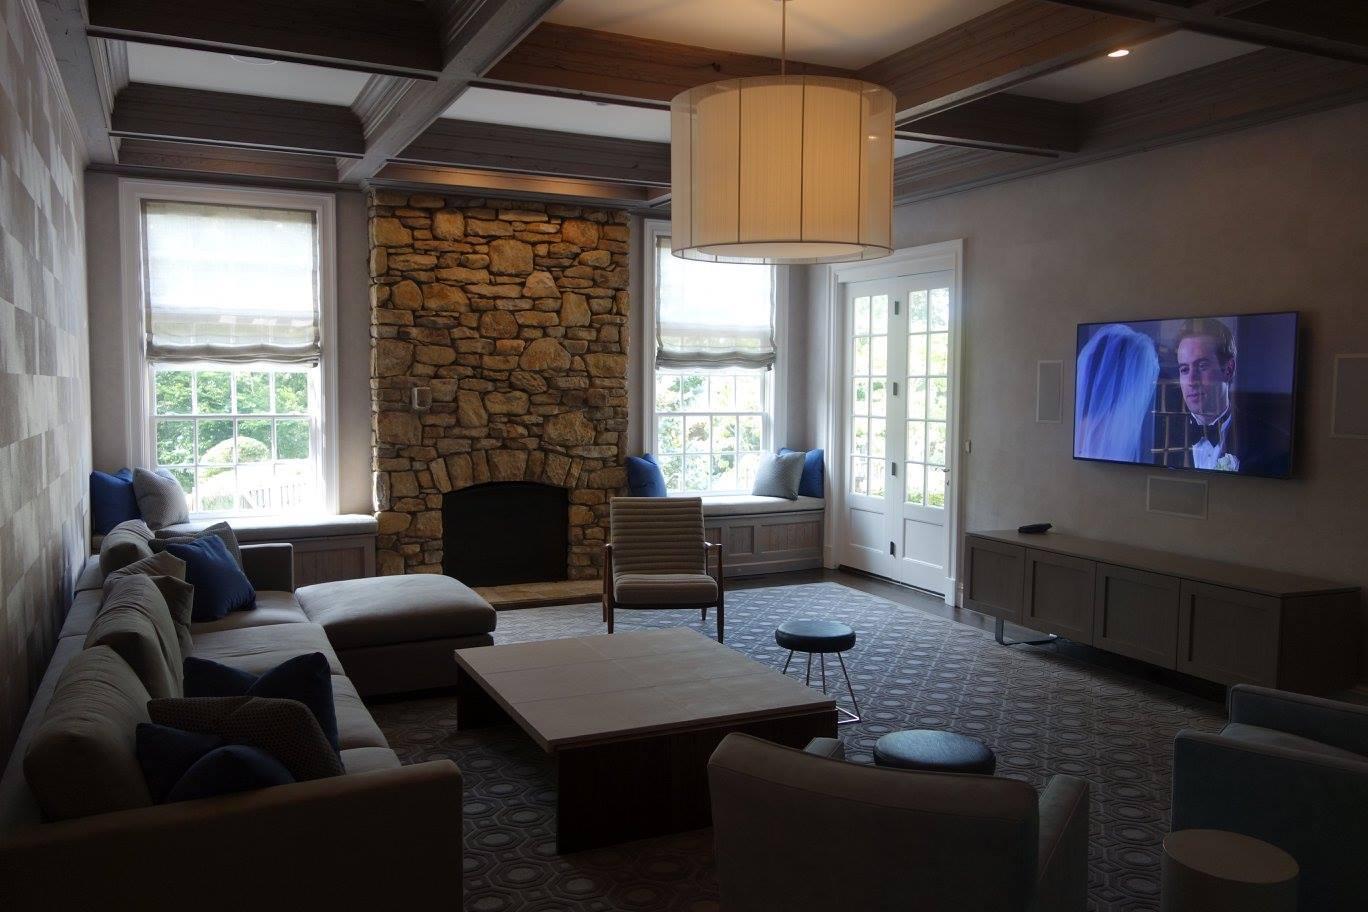 Smart Homes in Franklin Lakes, Millburn, Mendham